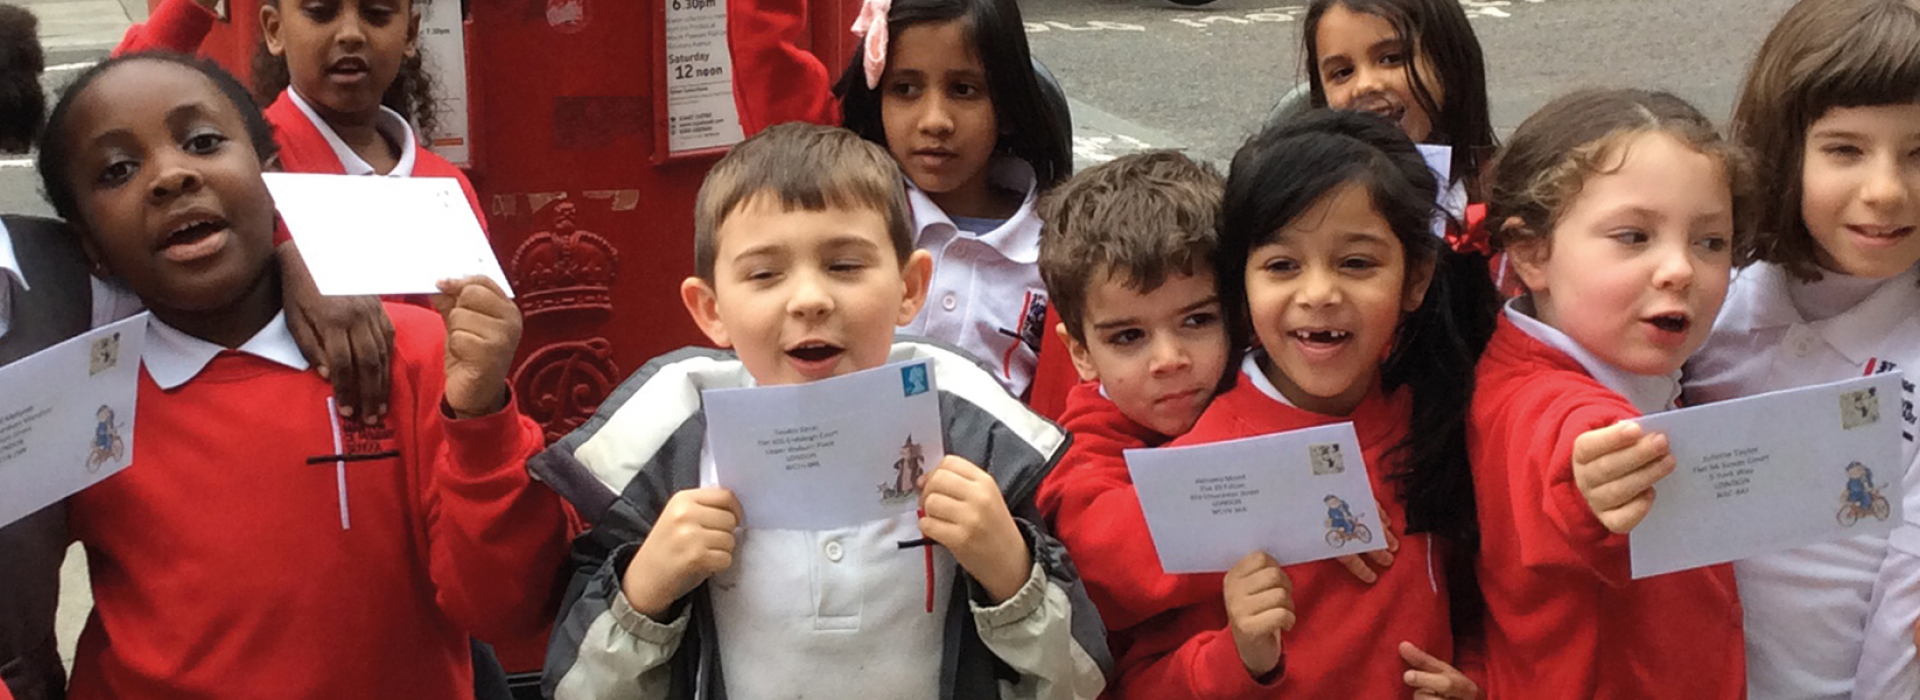 Children image London